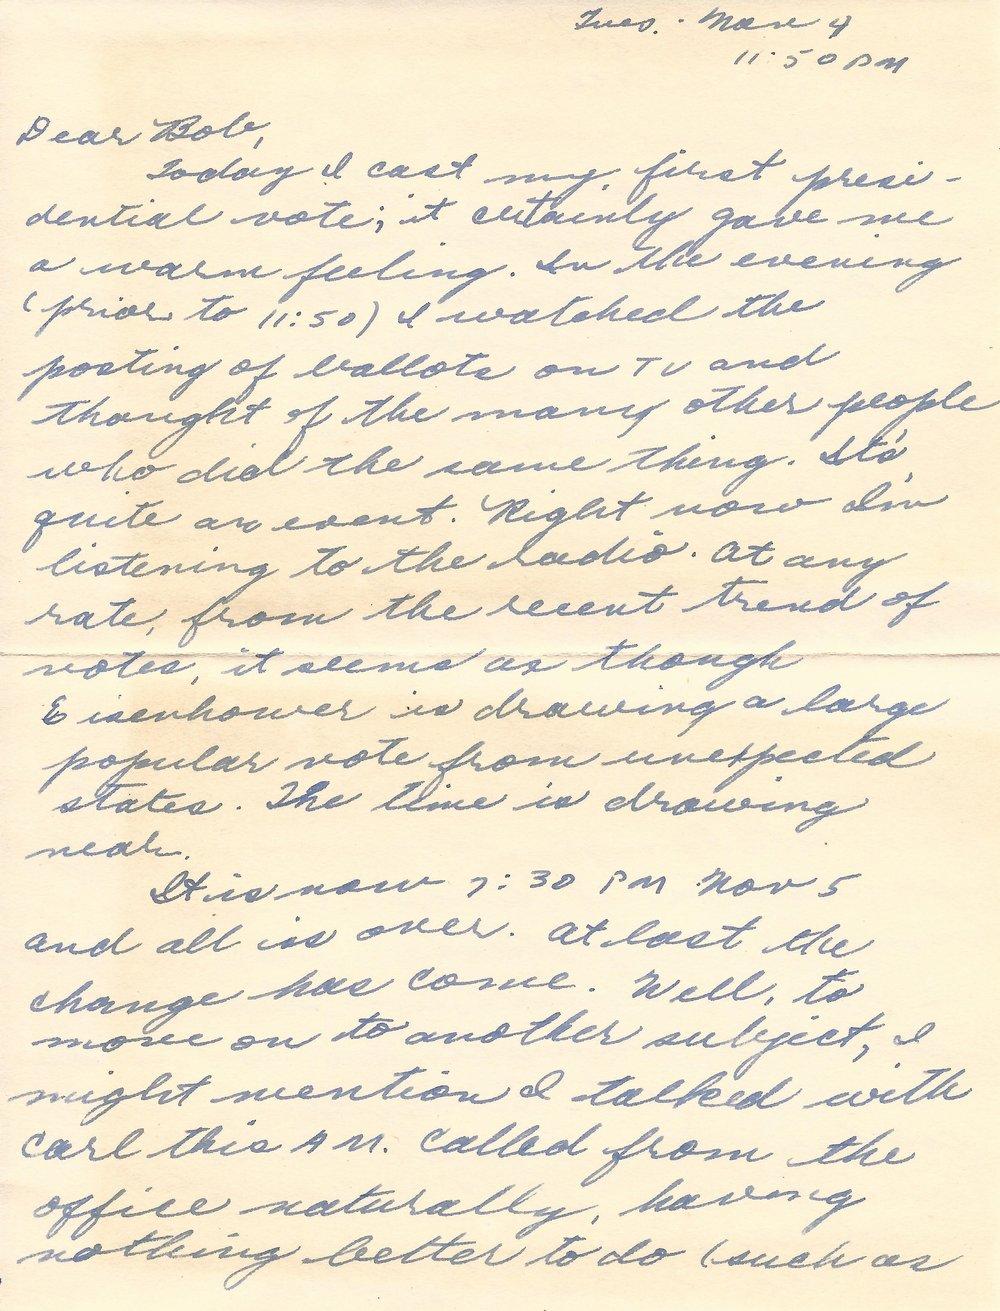 3. Nov. 4-5, 1952 (Oma)_Page_2.jpg